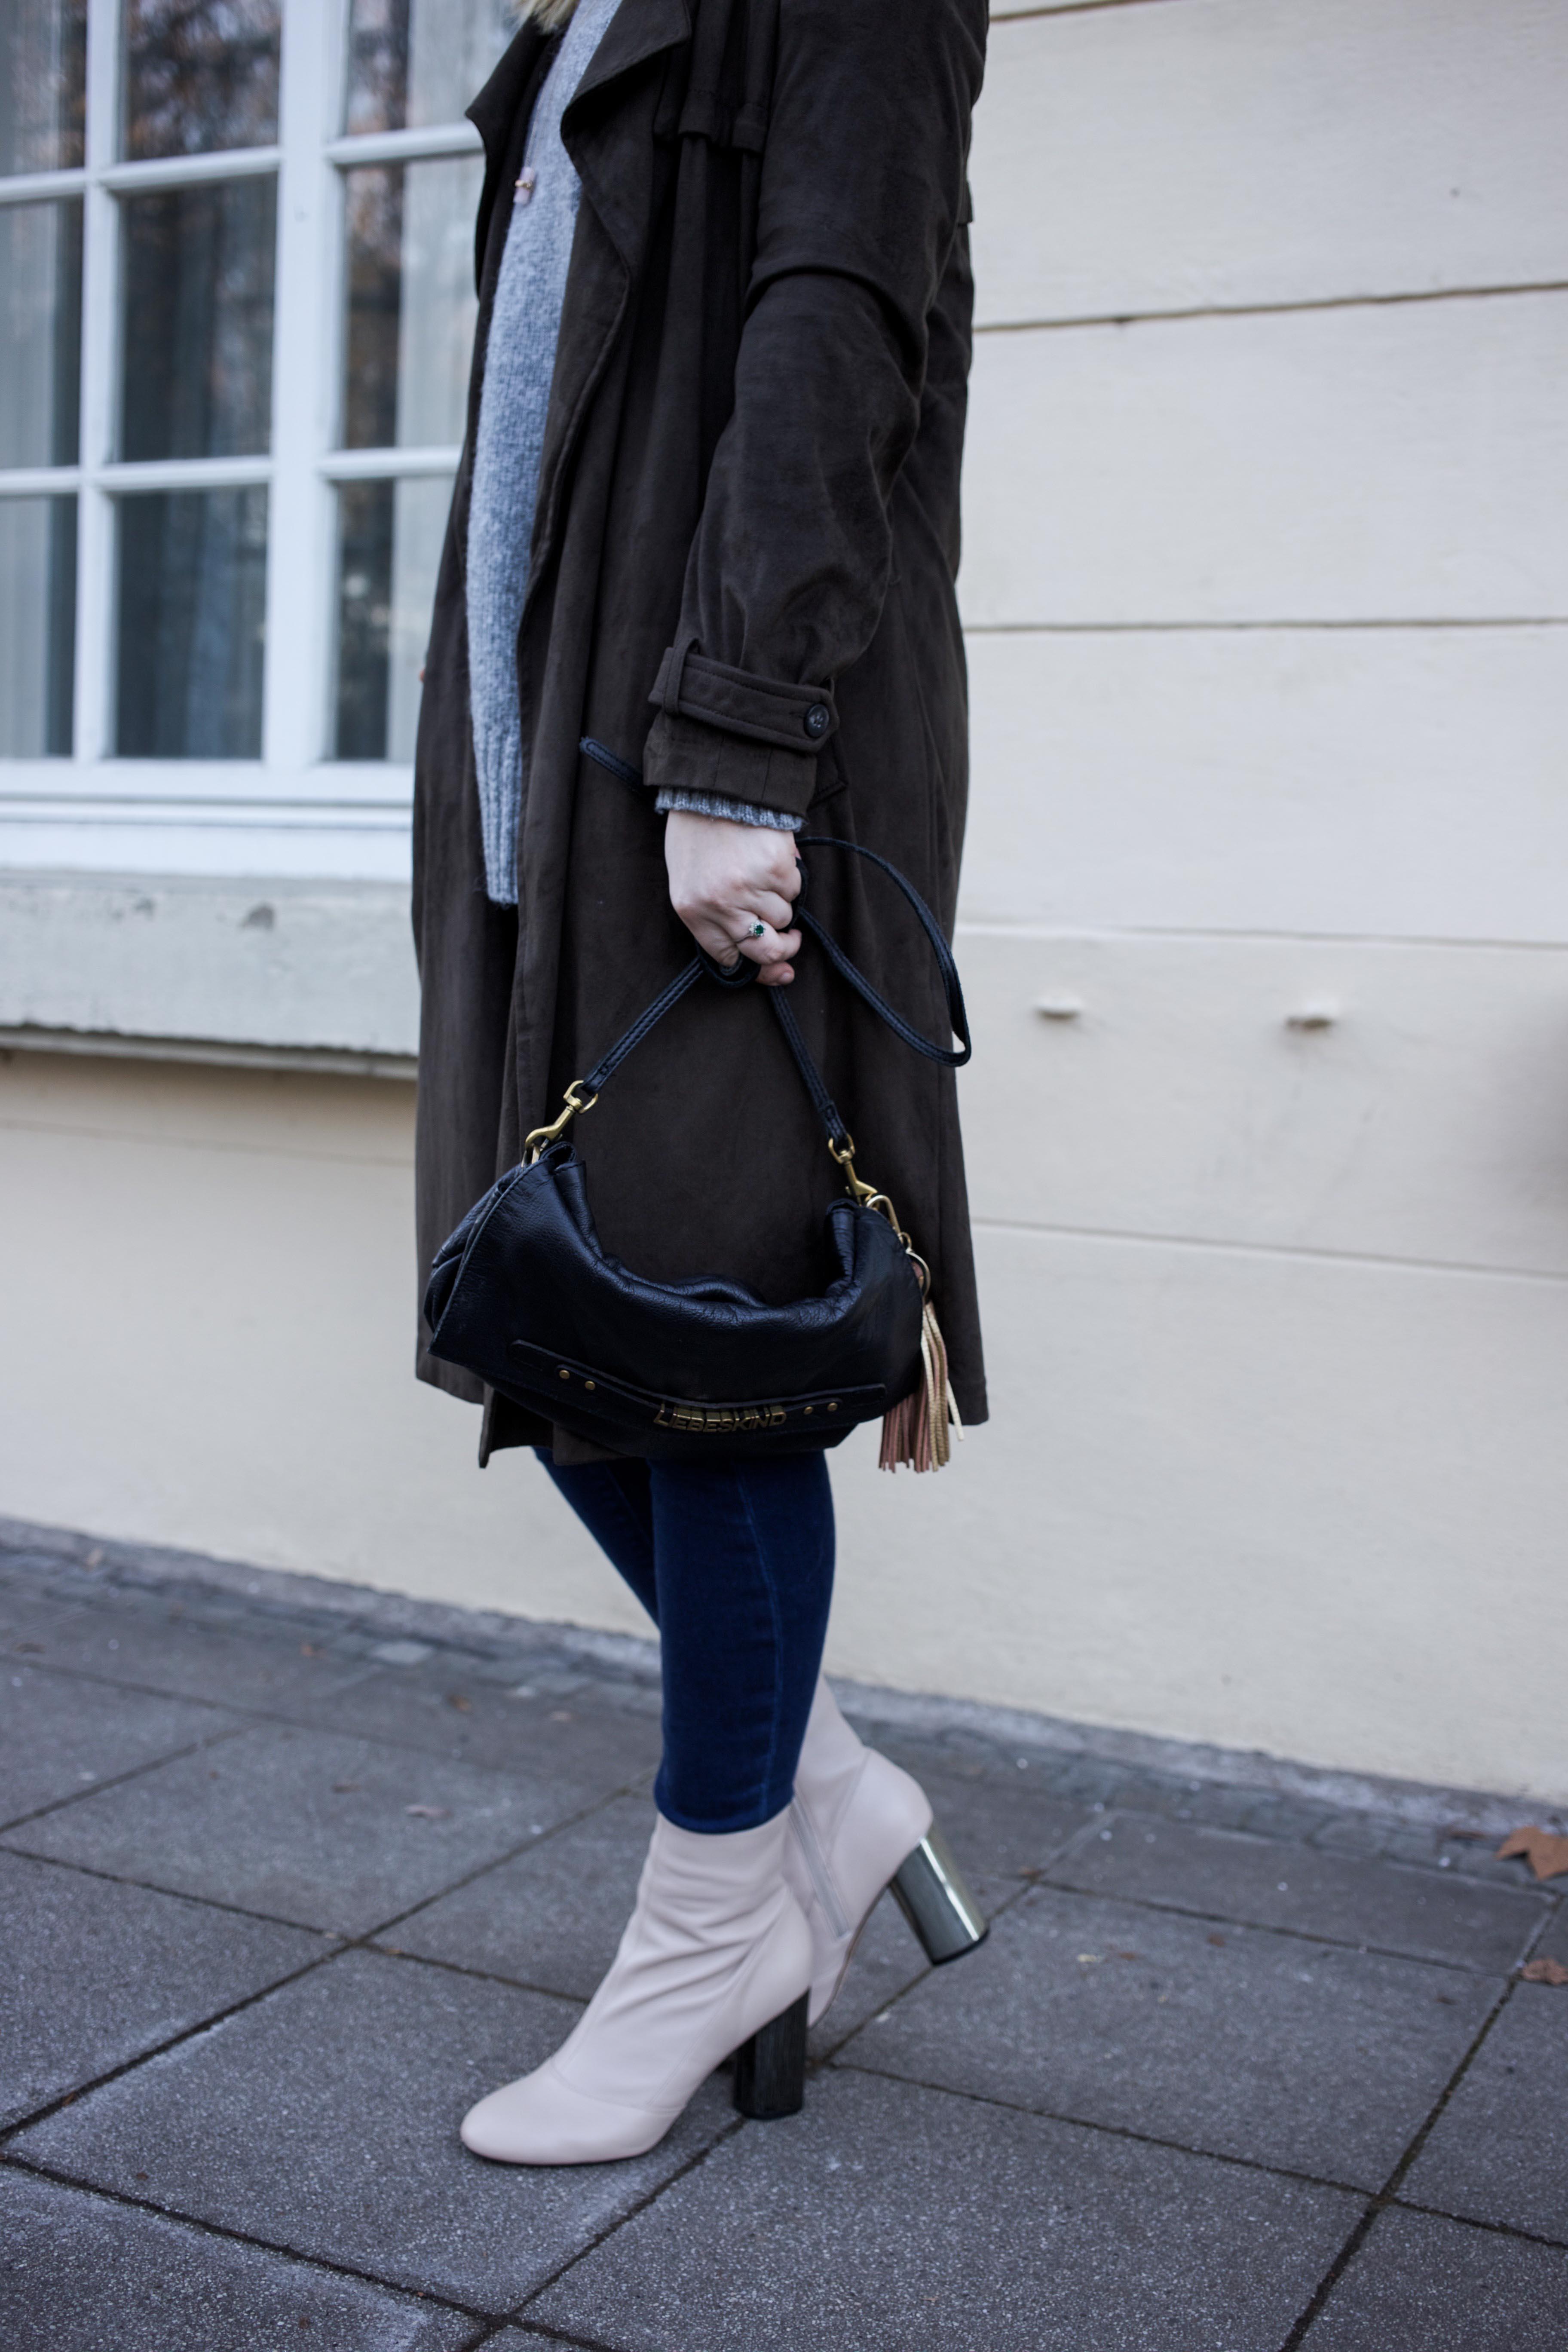 turtleneck-trench-coat-streetstyle-modeblog-fashionblog-bonn-berlin-köln-lederstiefel-silberabsatz-outfi_9240